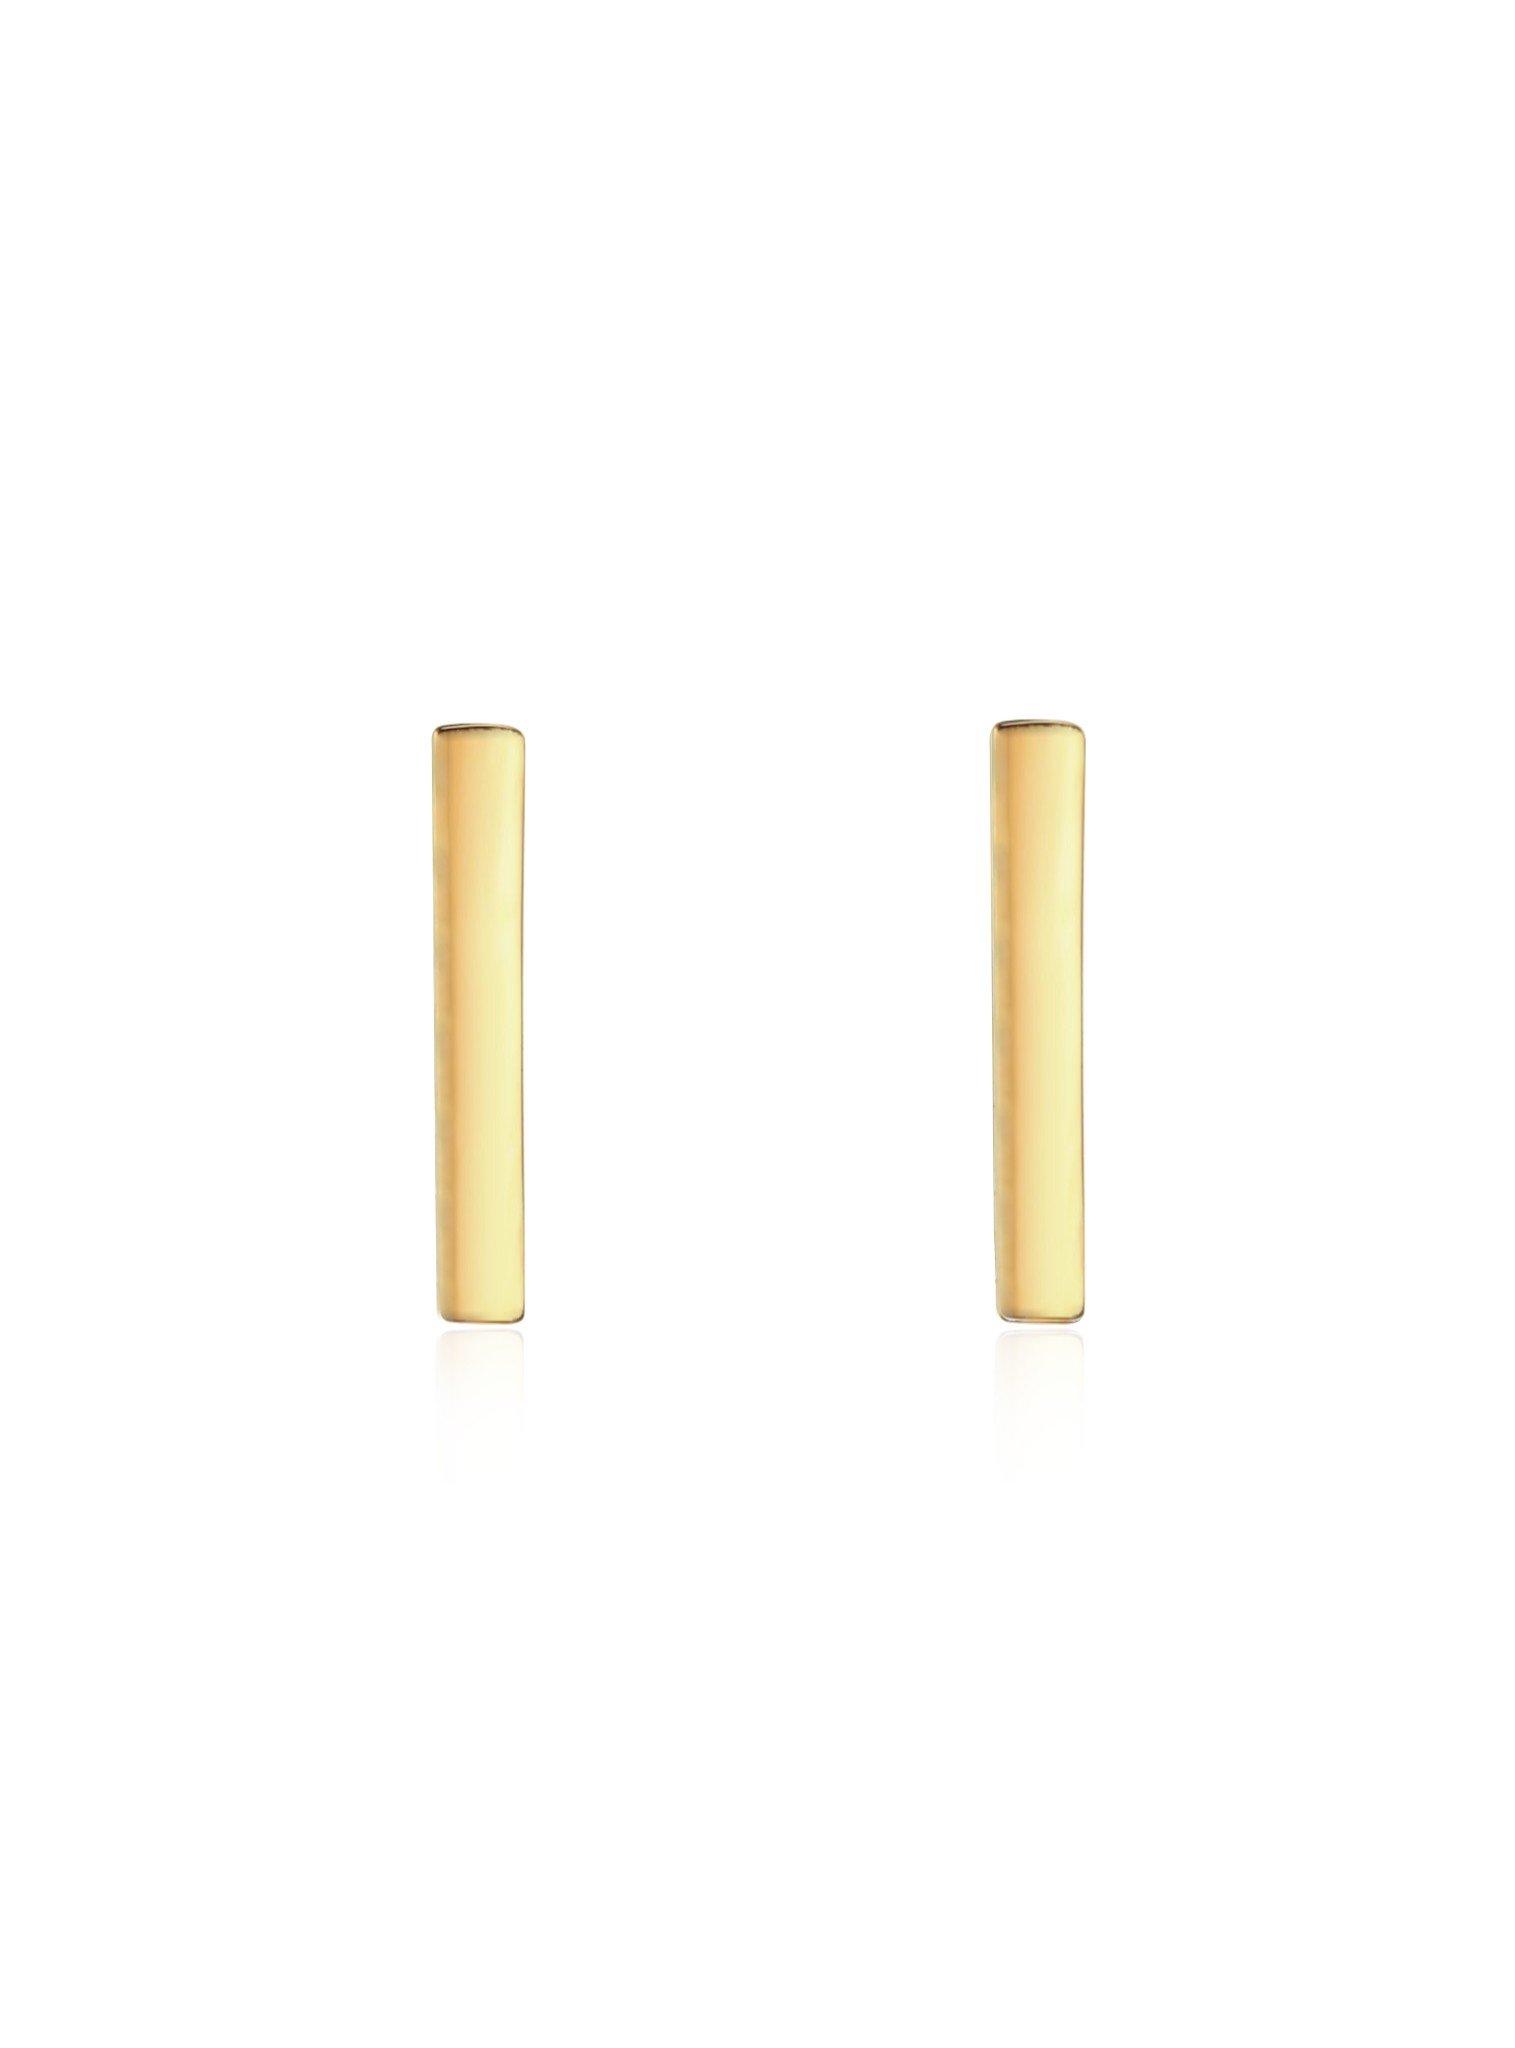 Dakota Simple Bar Stud Earrings in Gold